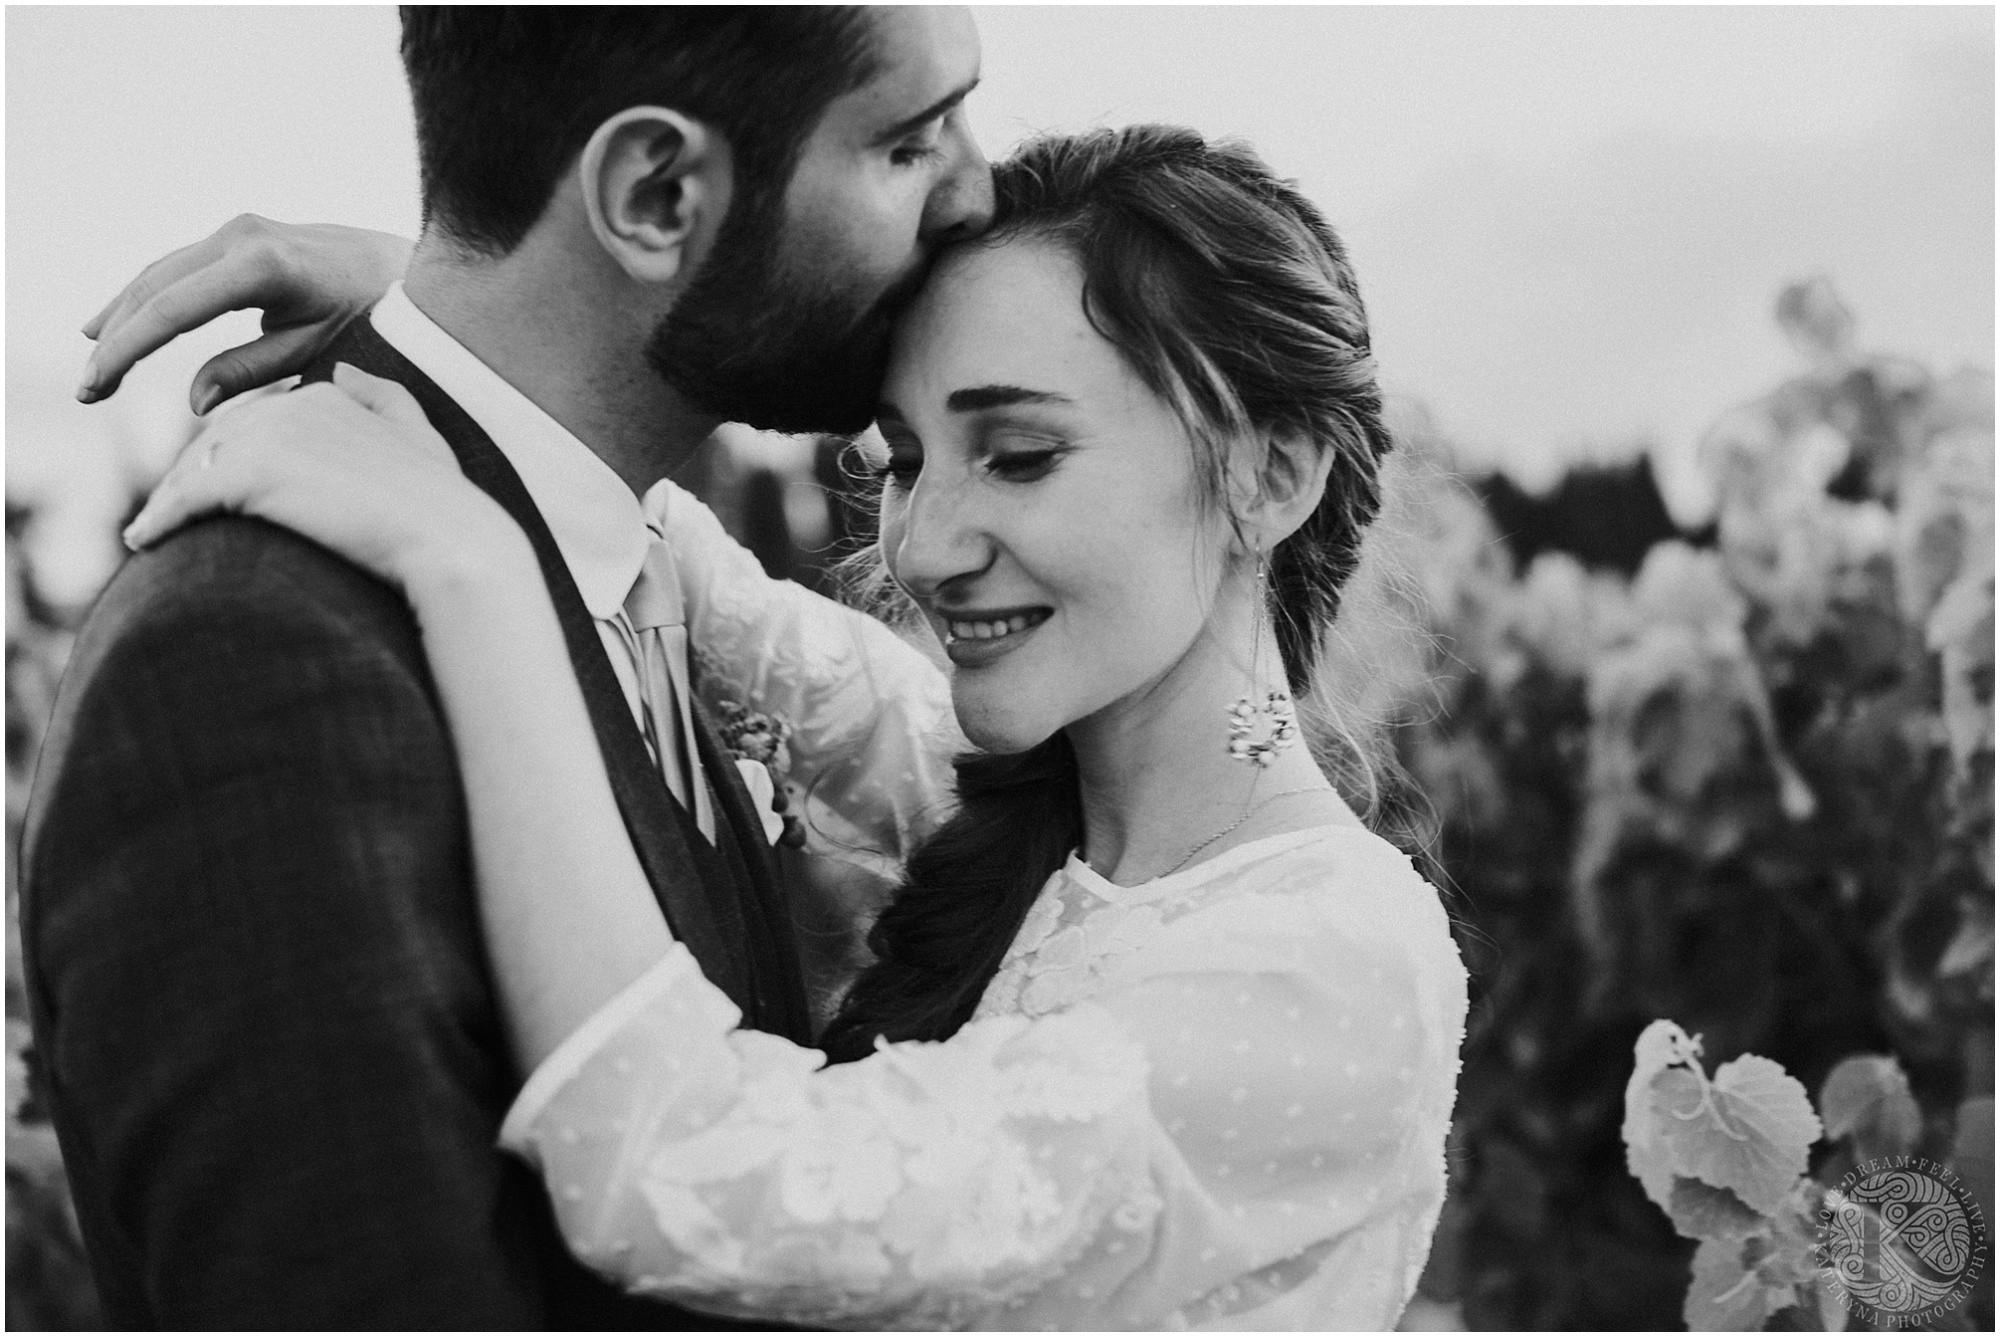 Kateryna-photos-photographe-mariage-vaucluse-provence-avignon-ferme-st-hugues_0084.jpg